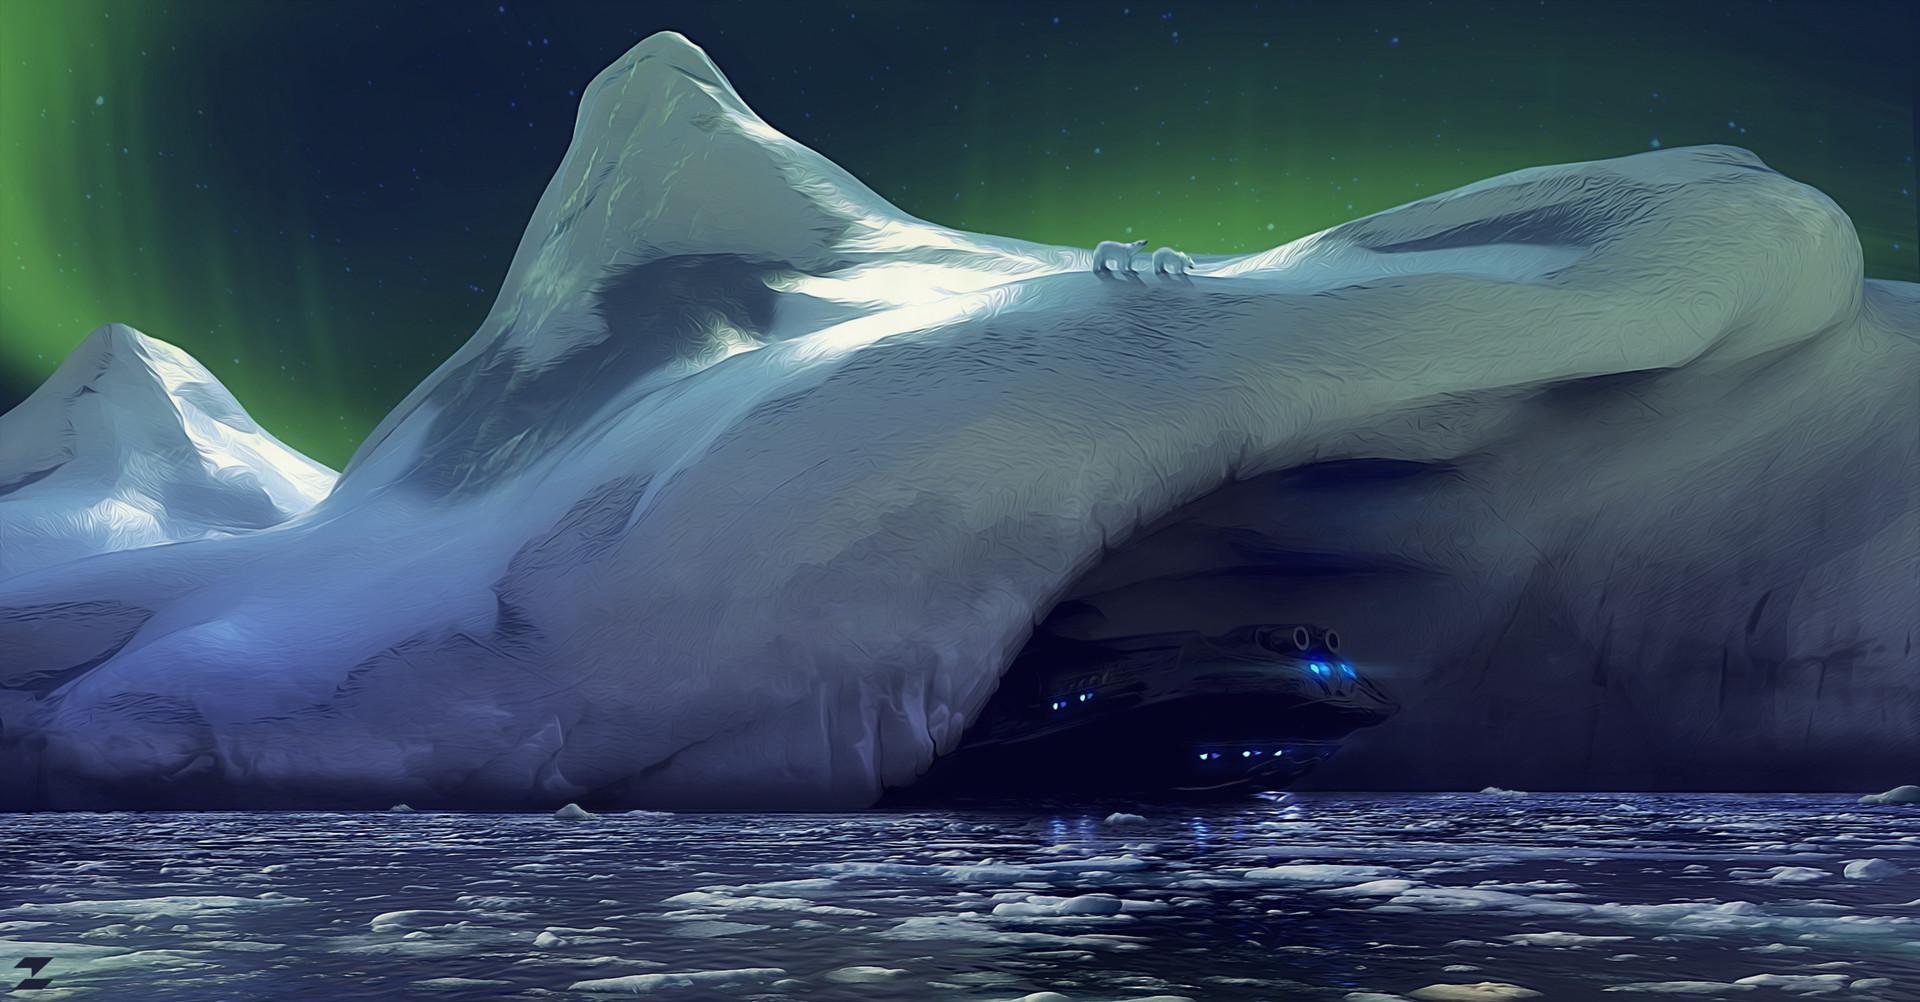 Tomislav zvonaric antartica secret exit